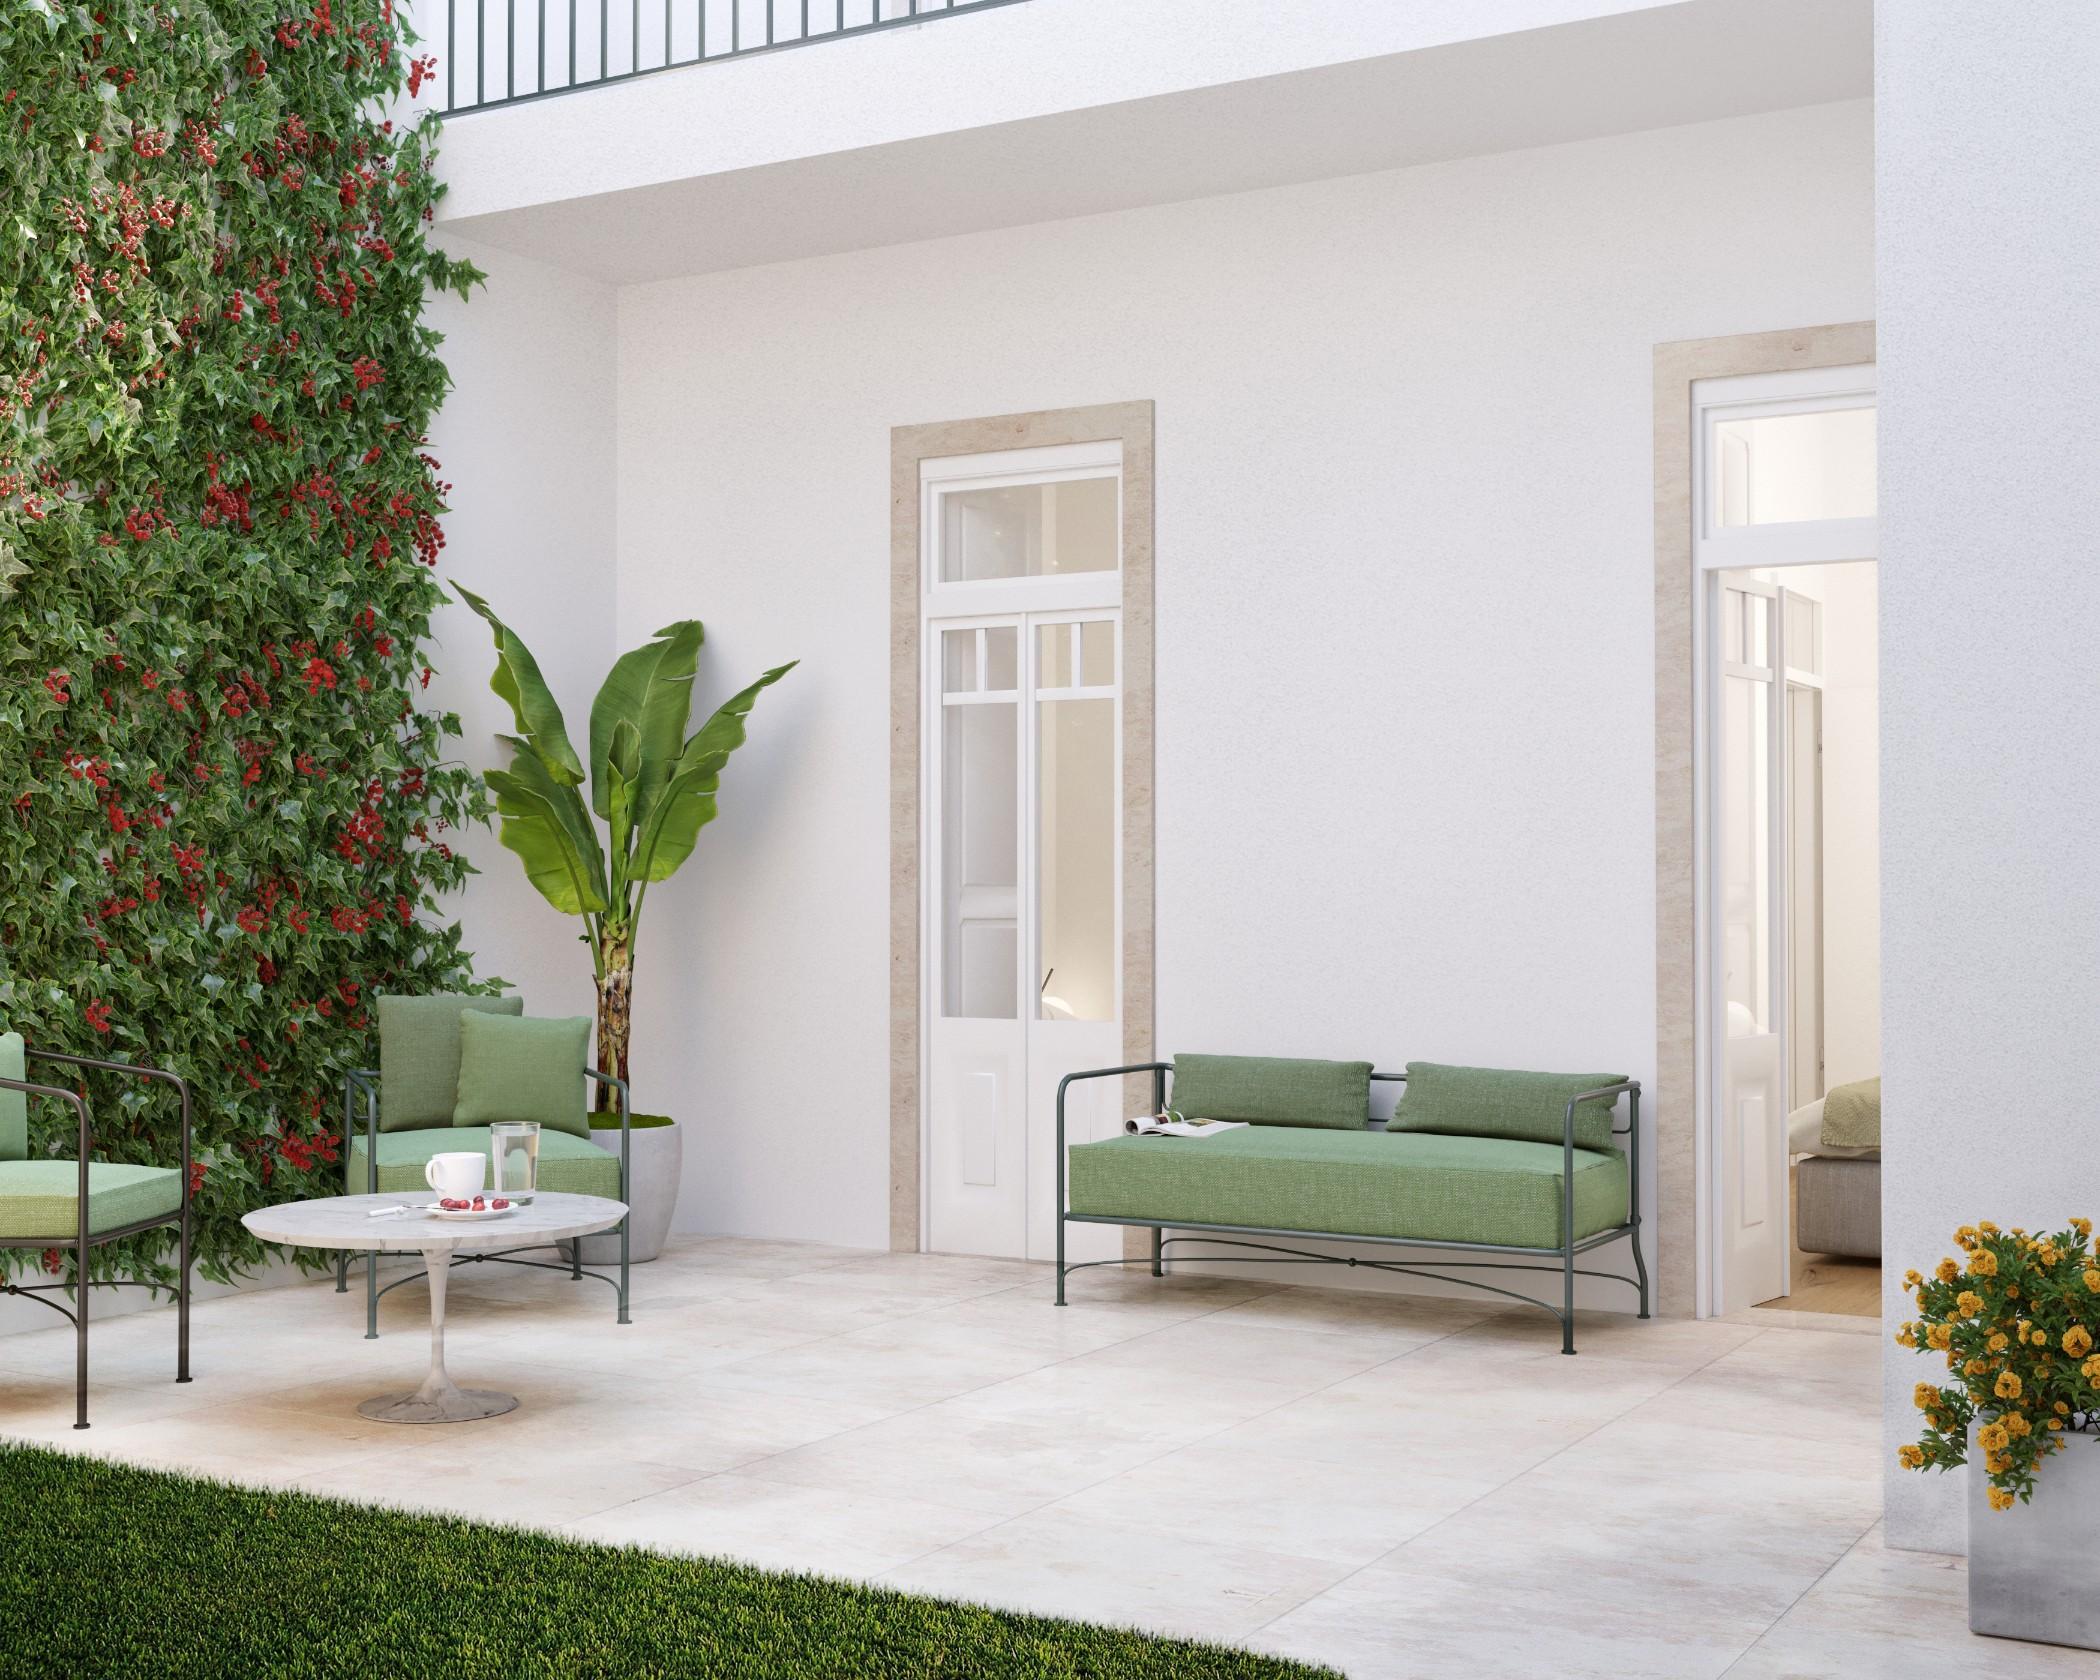 Lisbon Apartments for Sale - Atalaia - Bairro Alto